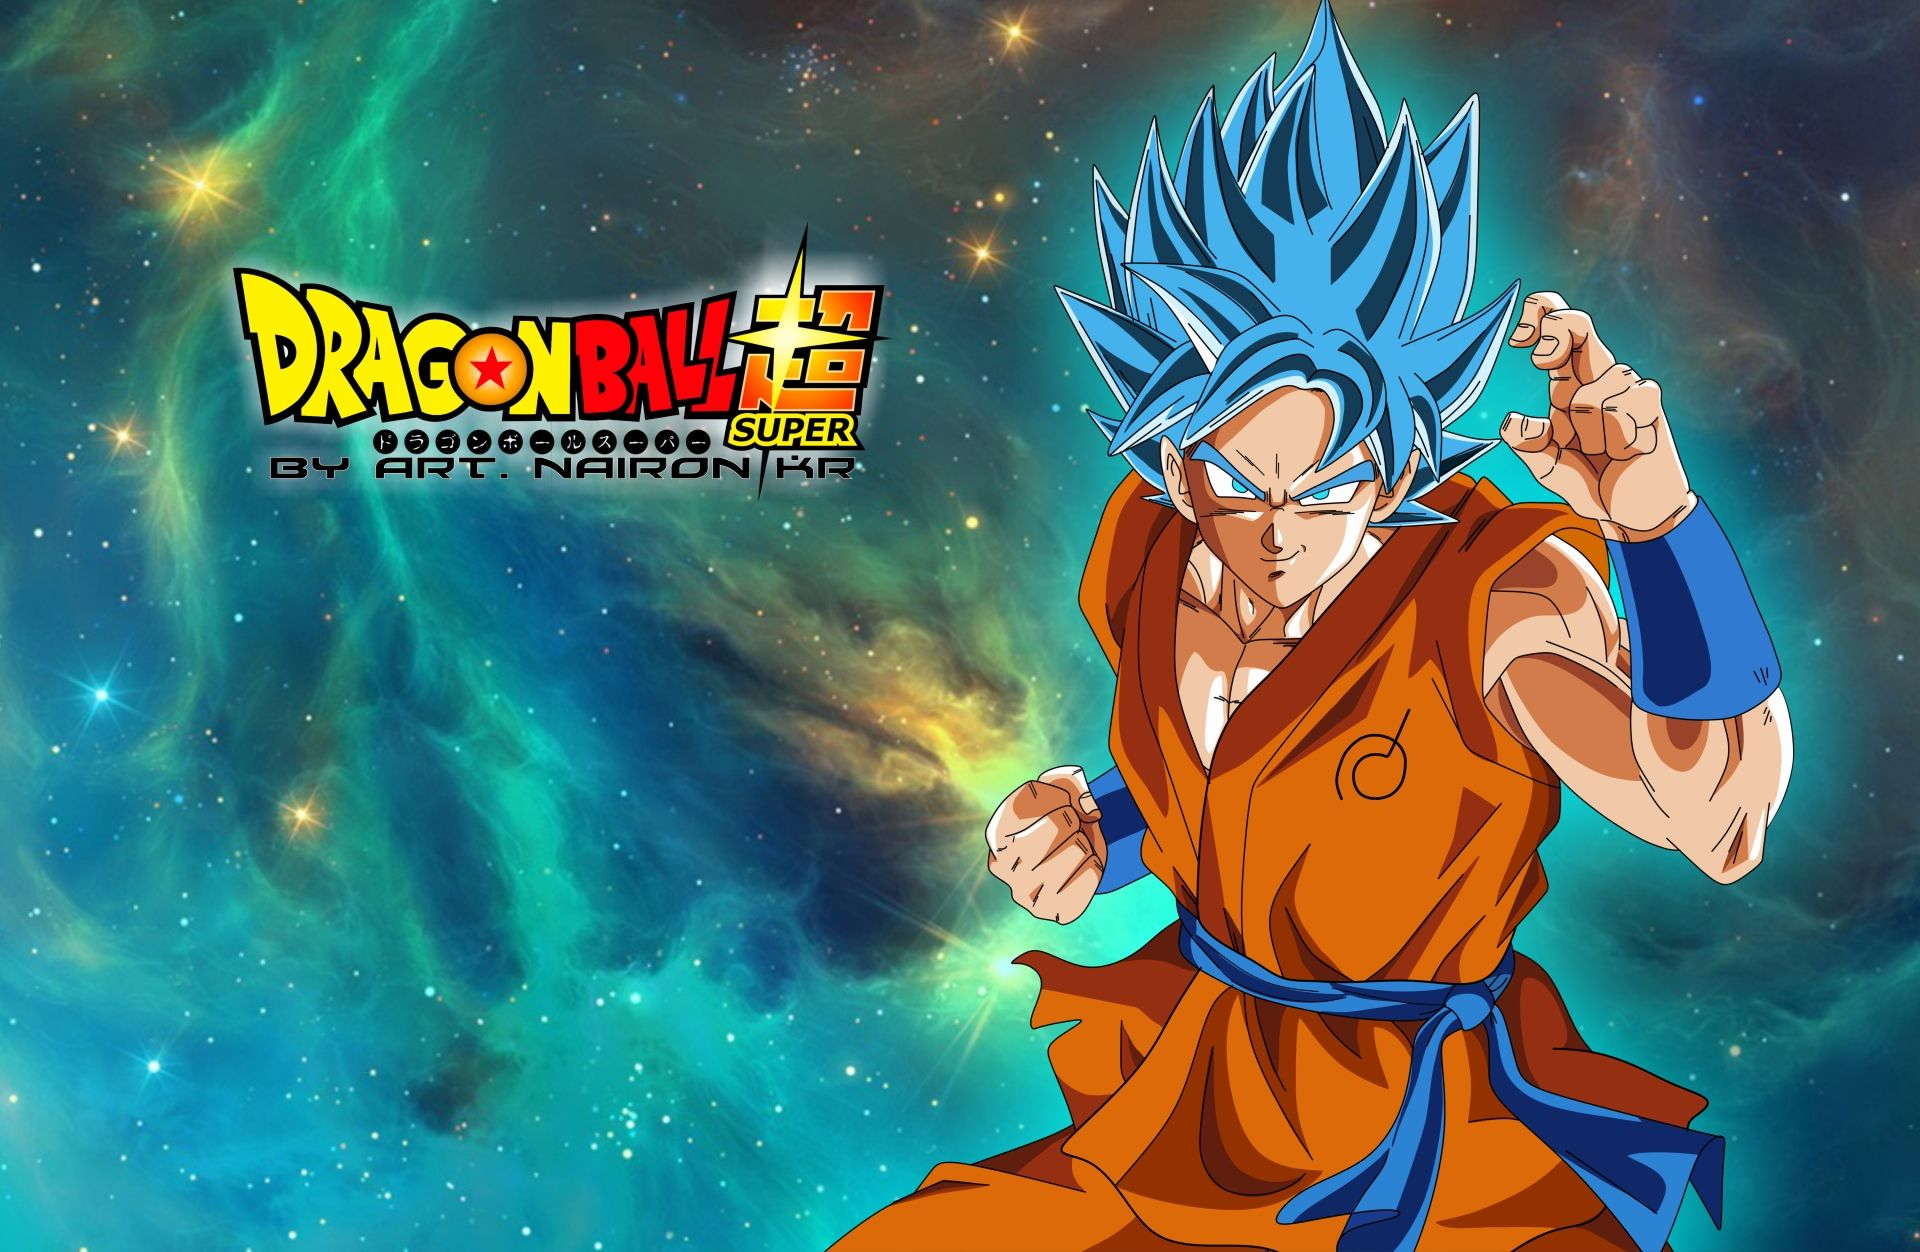 10 Latest Dragon Ball Super Backgrounds Full Hd 1080p For Pc Desktop Anime Dragon Ball Super Dragon Ball Super Dragon Ball Super Wallpapers 1080p dragon ball super wallpaper hd